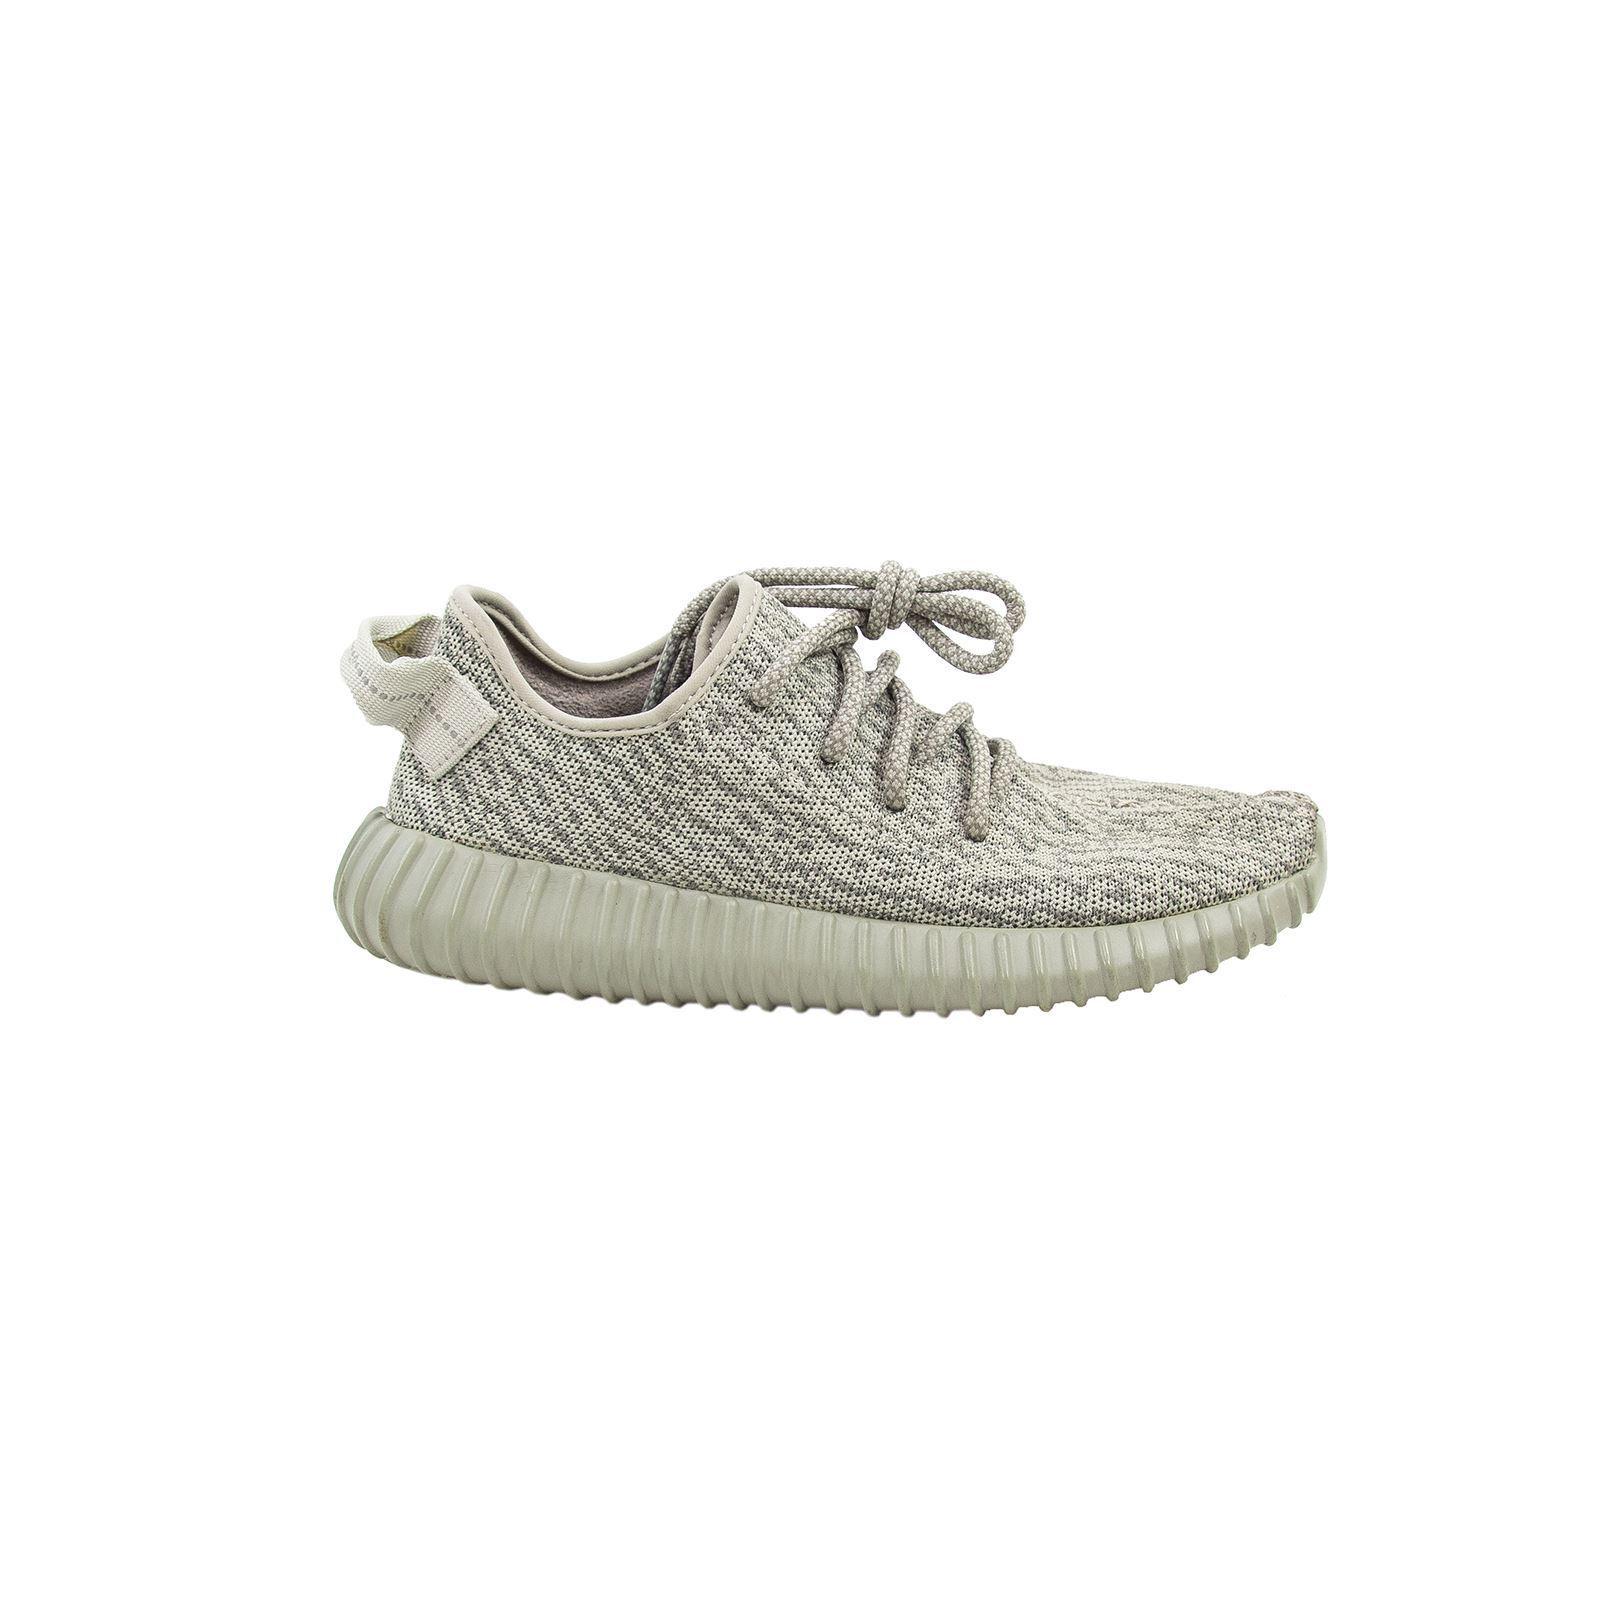 Lnwob Adidas Yeezy Boost 350 aq2660 Gris moonrock 5,5 agagra Kanye West zapatillas 5,5 moonrock 269b72